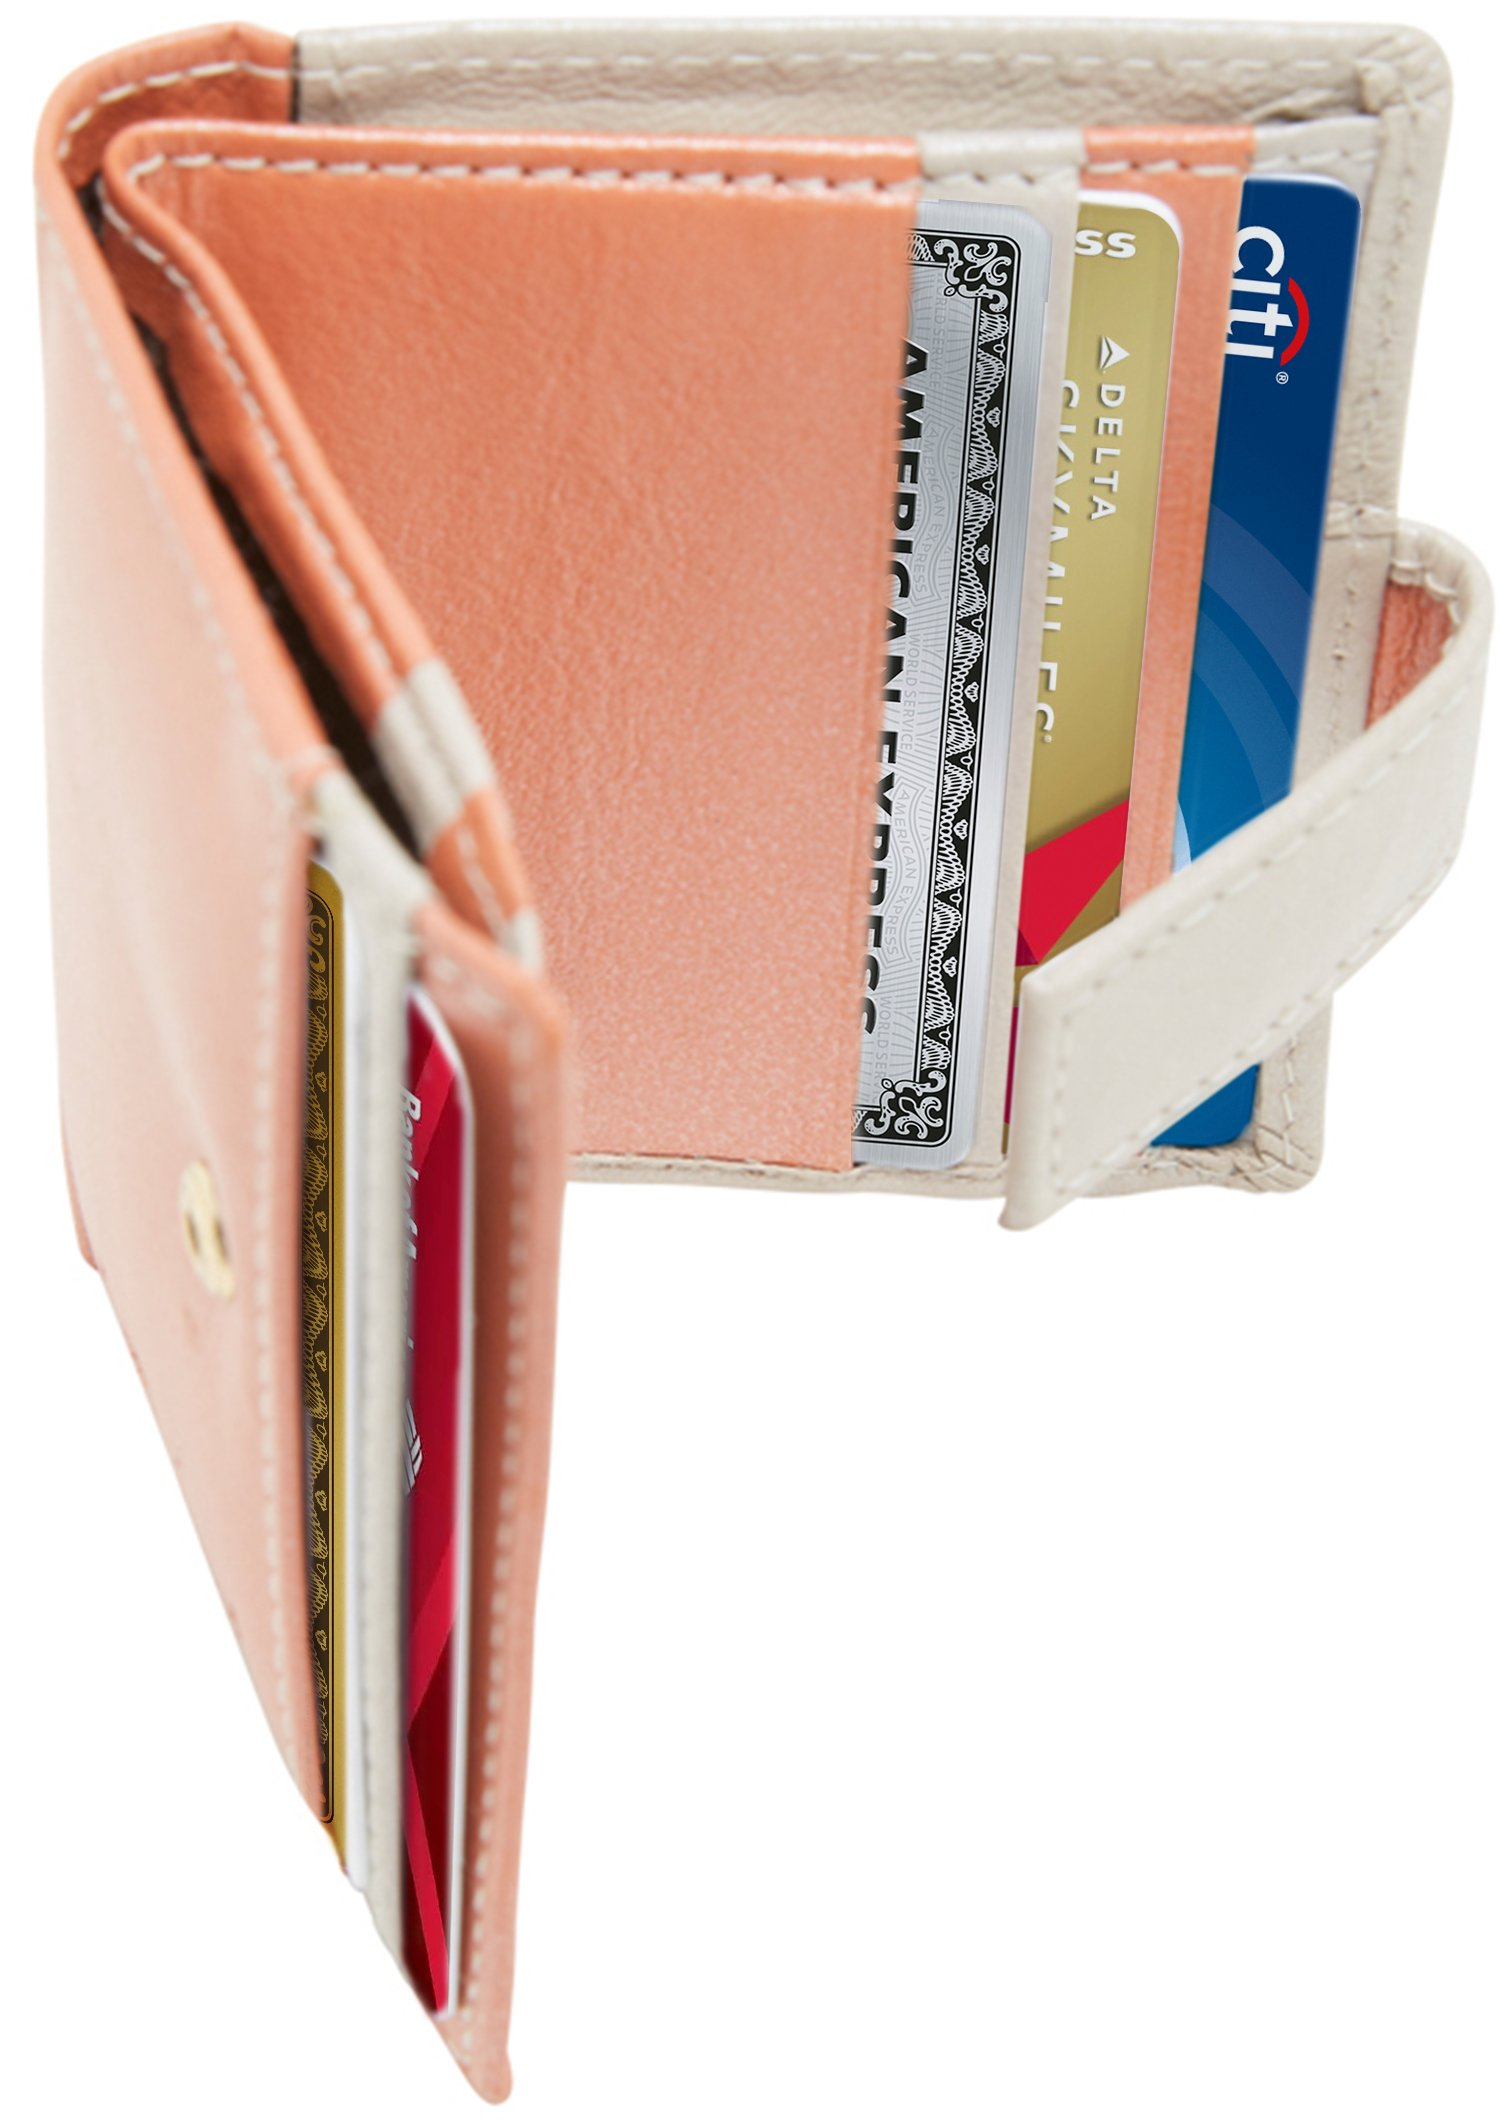 Small Bifold Wallets For Women RFID Blocking - Slim Organizer Leather Credit Card Holder